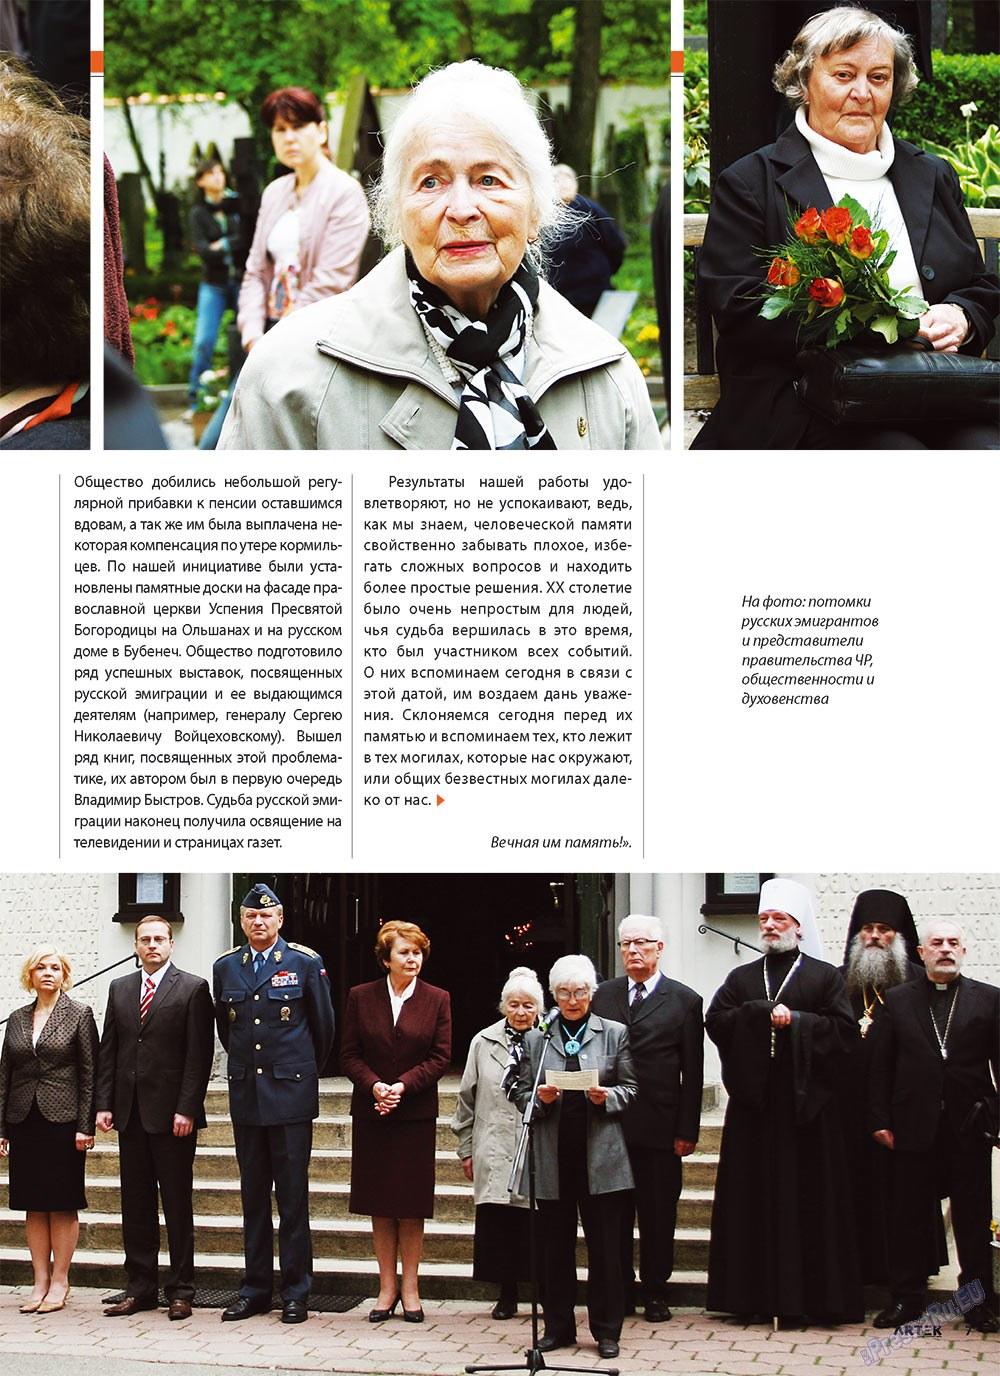 Артек (журнал). 2010 год, номер 3, стр. 9